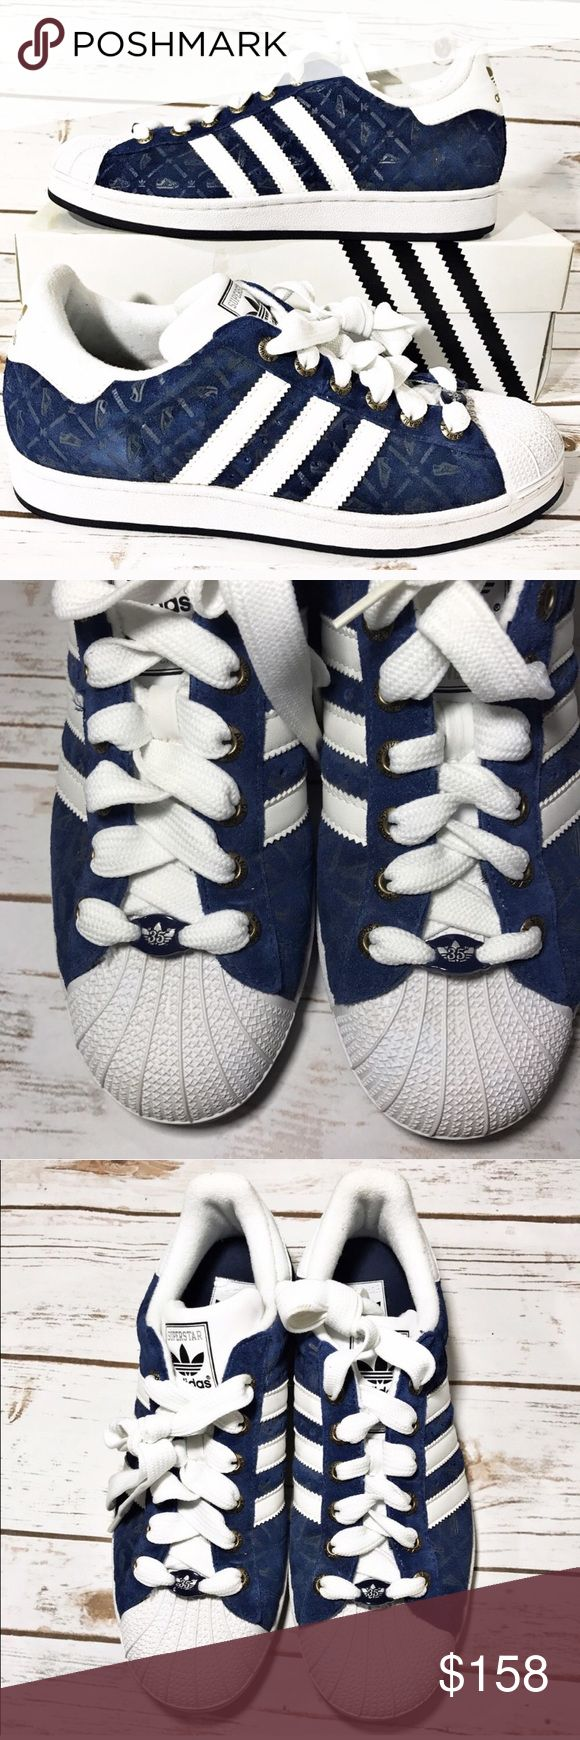 Adidas Superstar 35 aniversario serie 35 Top Secret formadores Outlet